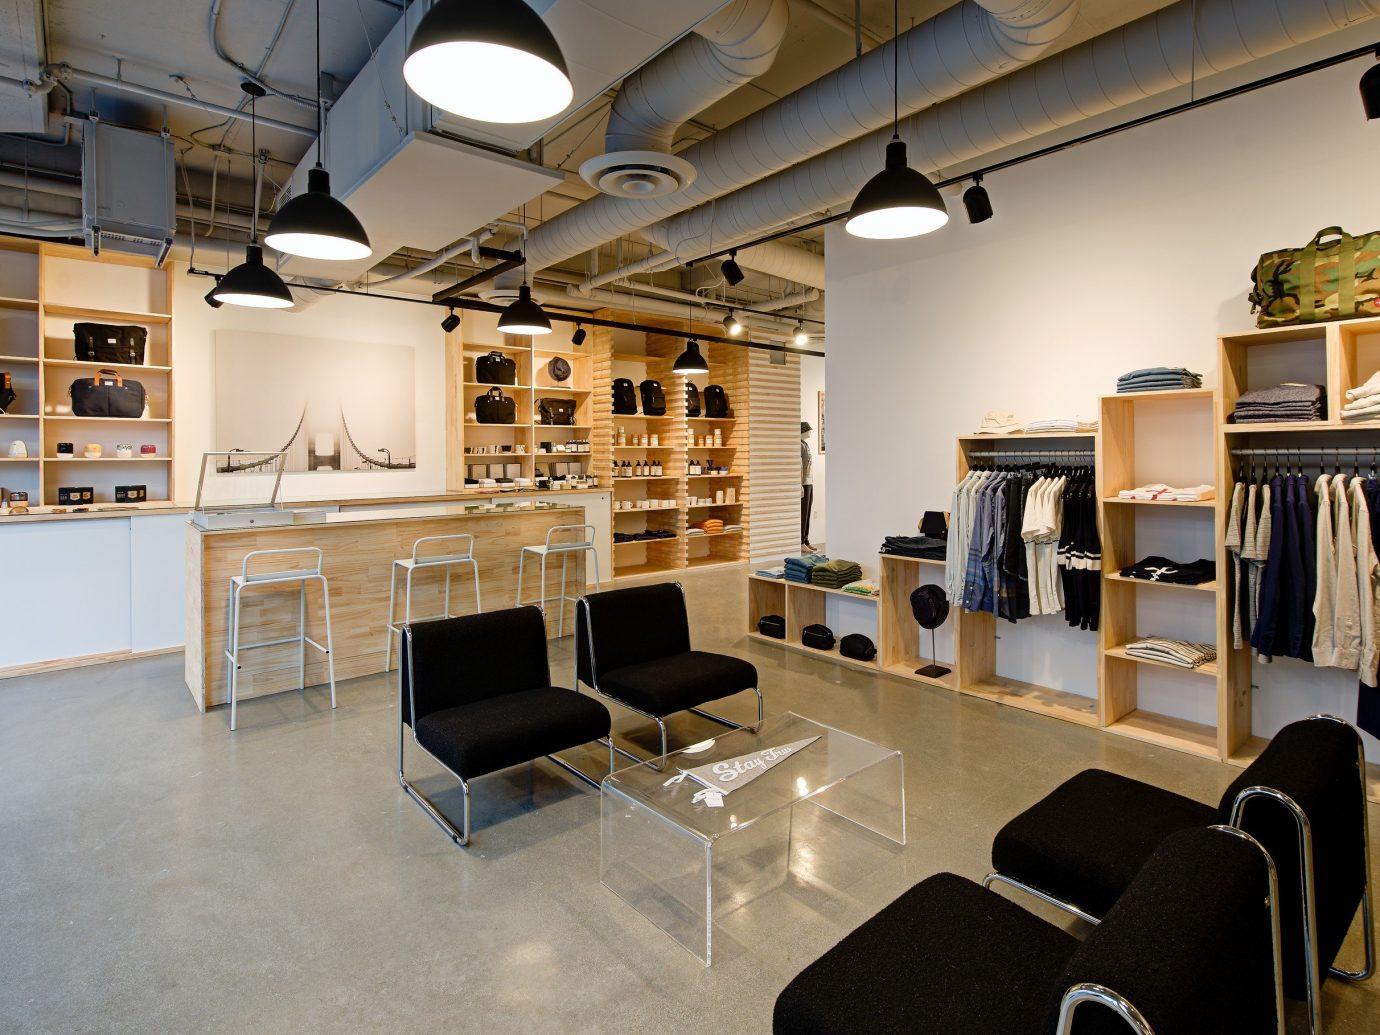 Trip Ideas floor indoor property room building interior design Design real estate office living room furniture